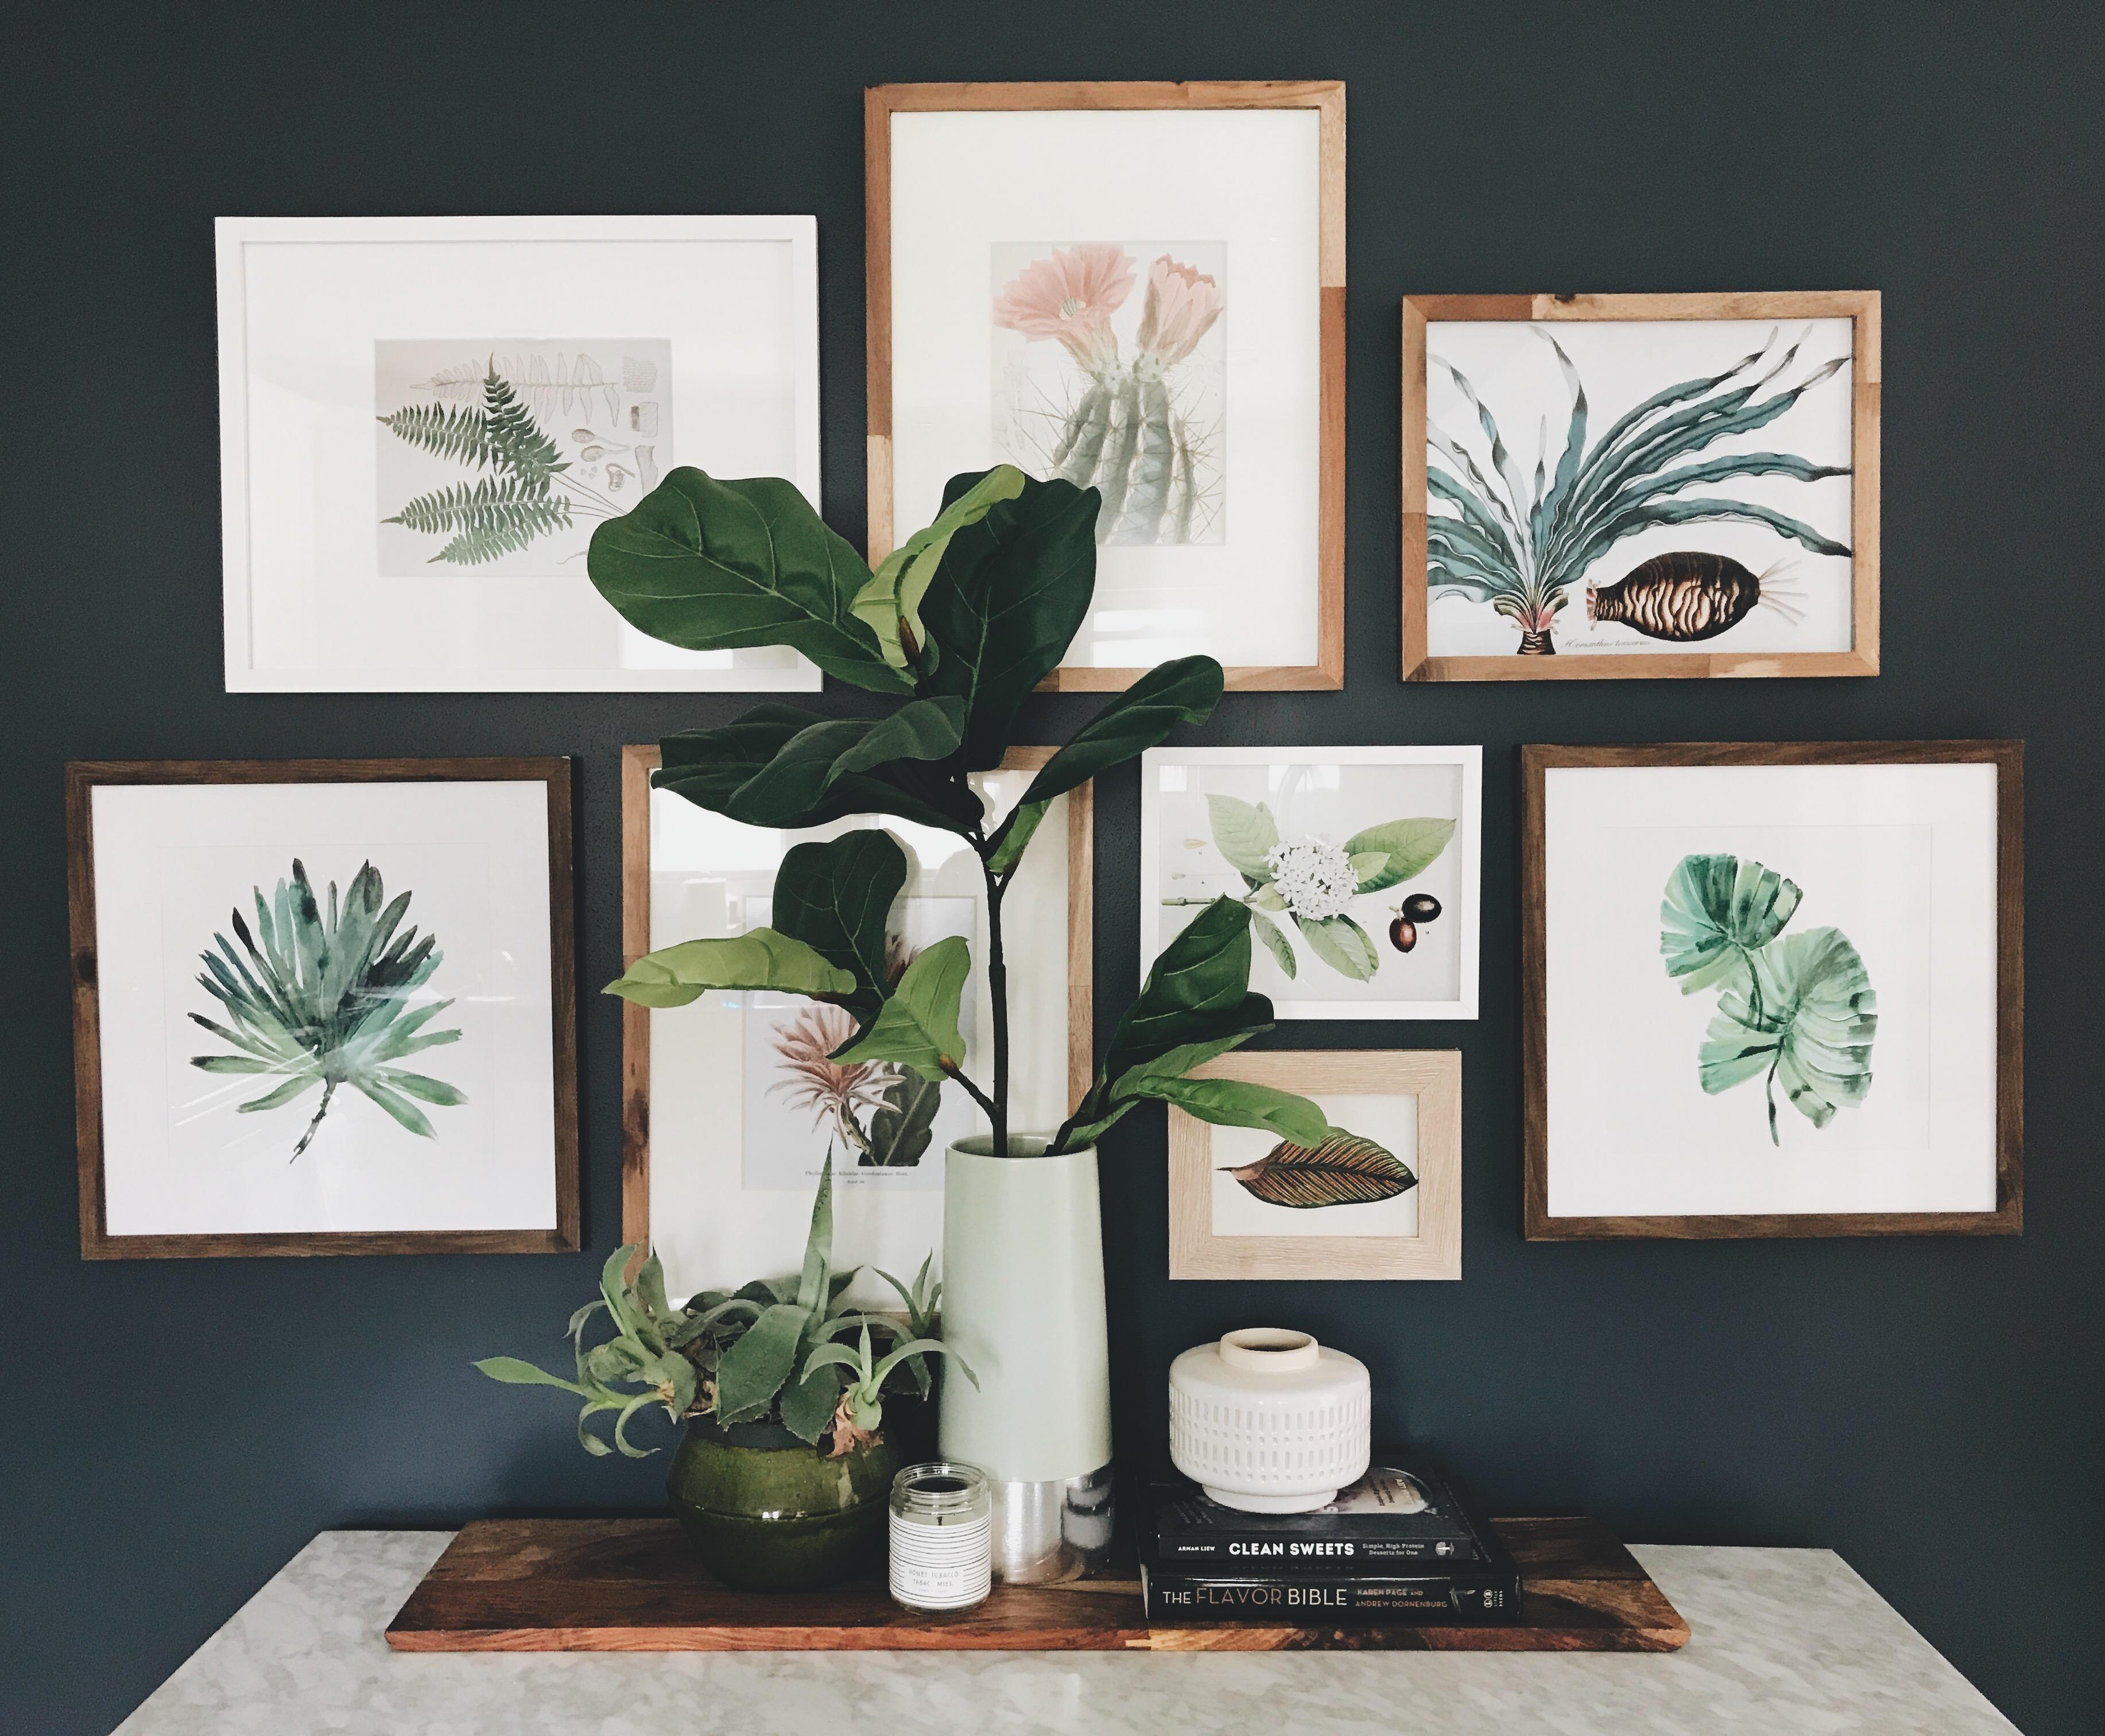 (DIY), VISUALTagged Art, Botanicals, Cactus, DIY, Ferns, Fiddle Leaf Fig, Gallery  Wall, Home, Home Decor, Leaf, Leaves, Photography, ...